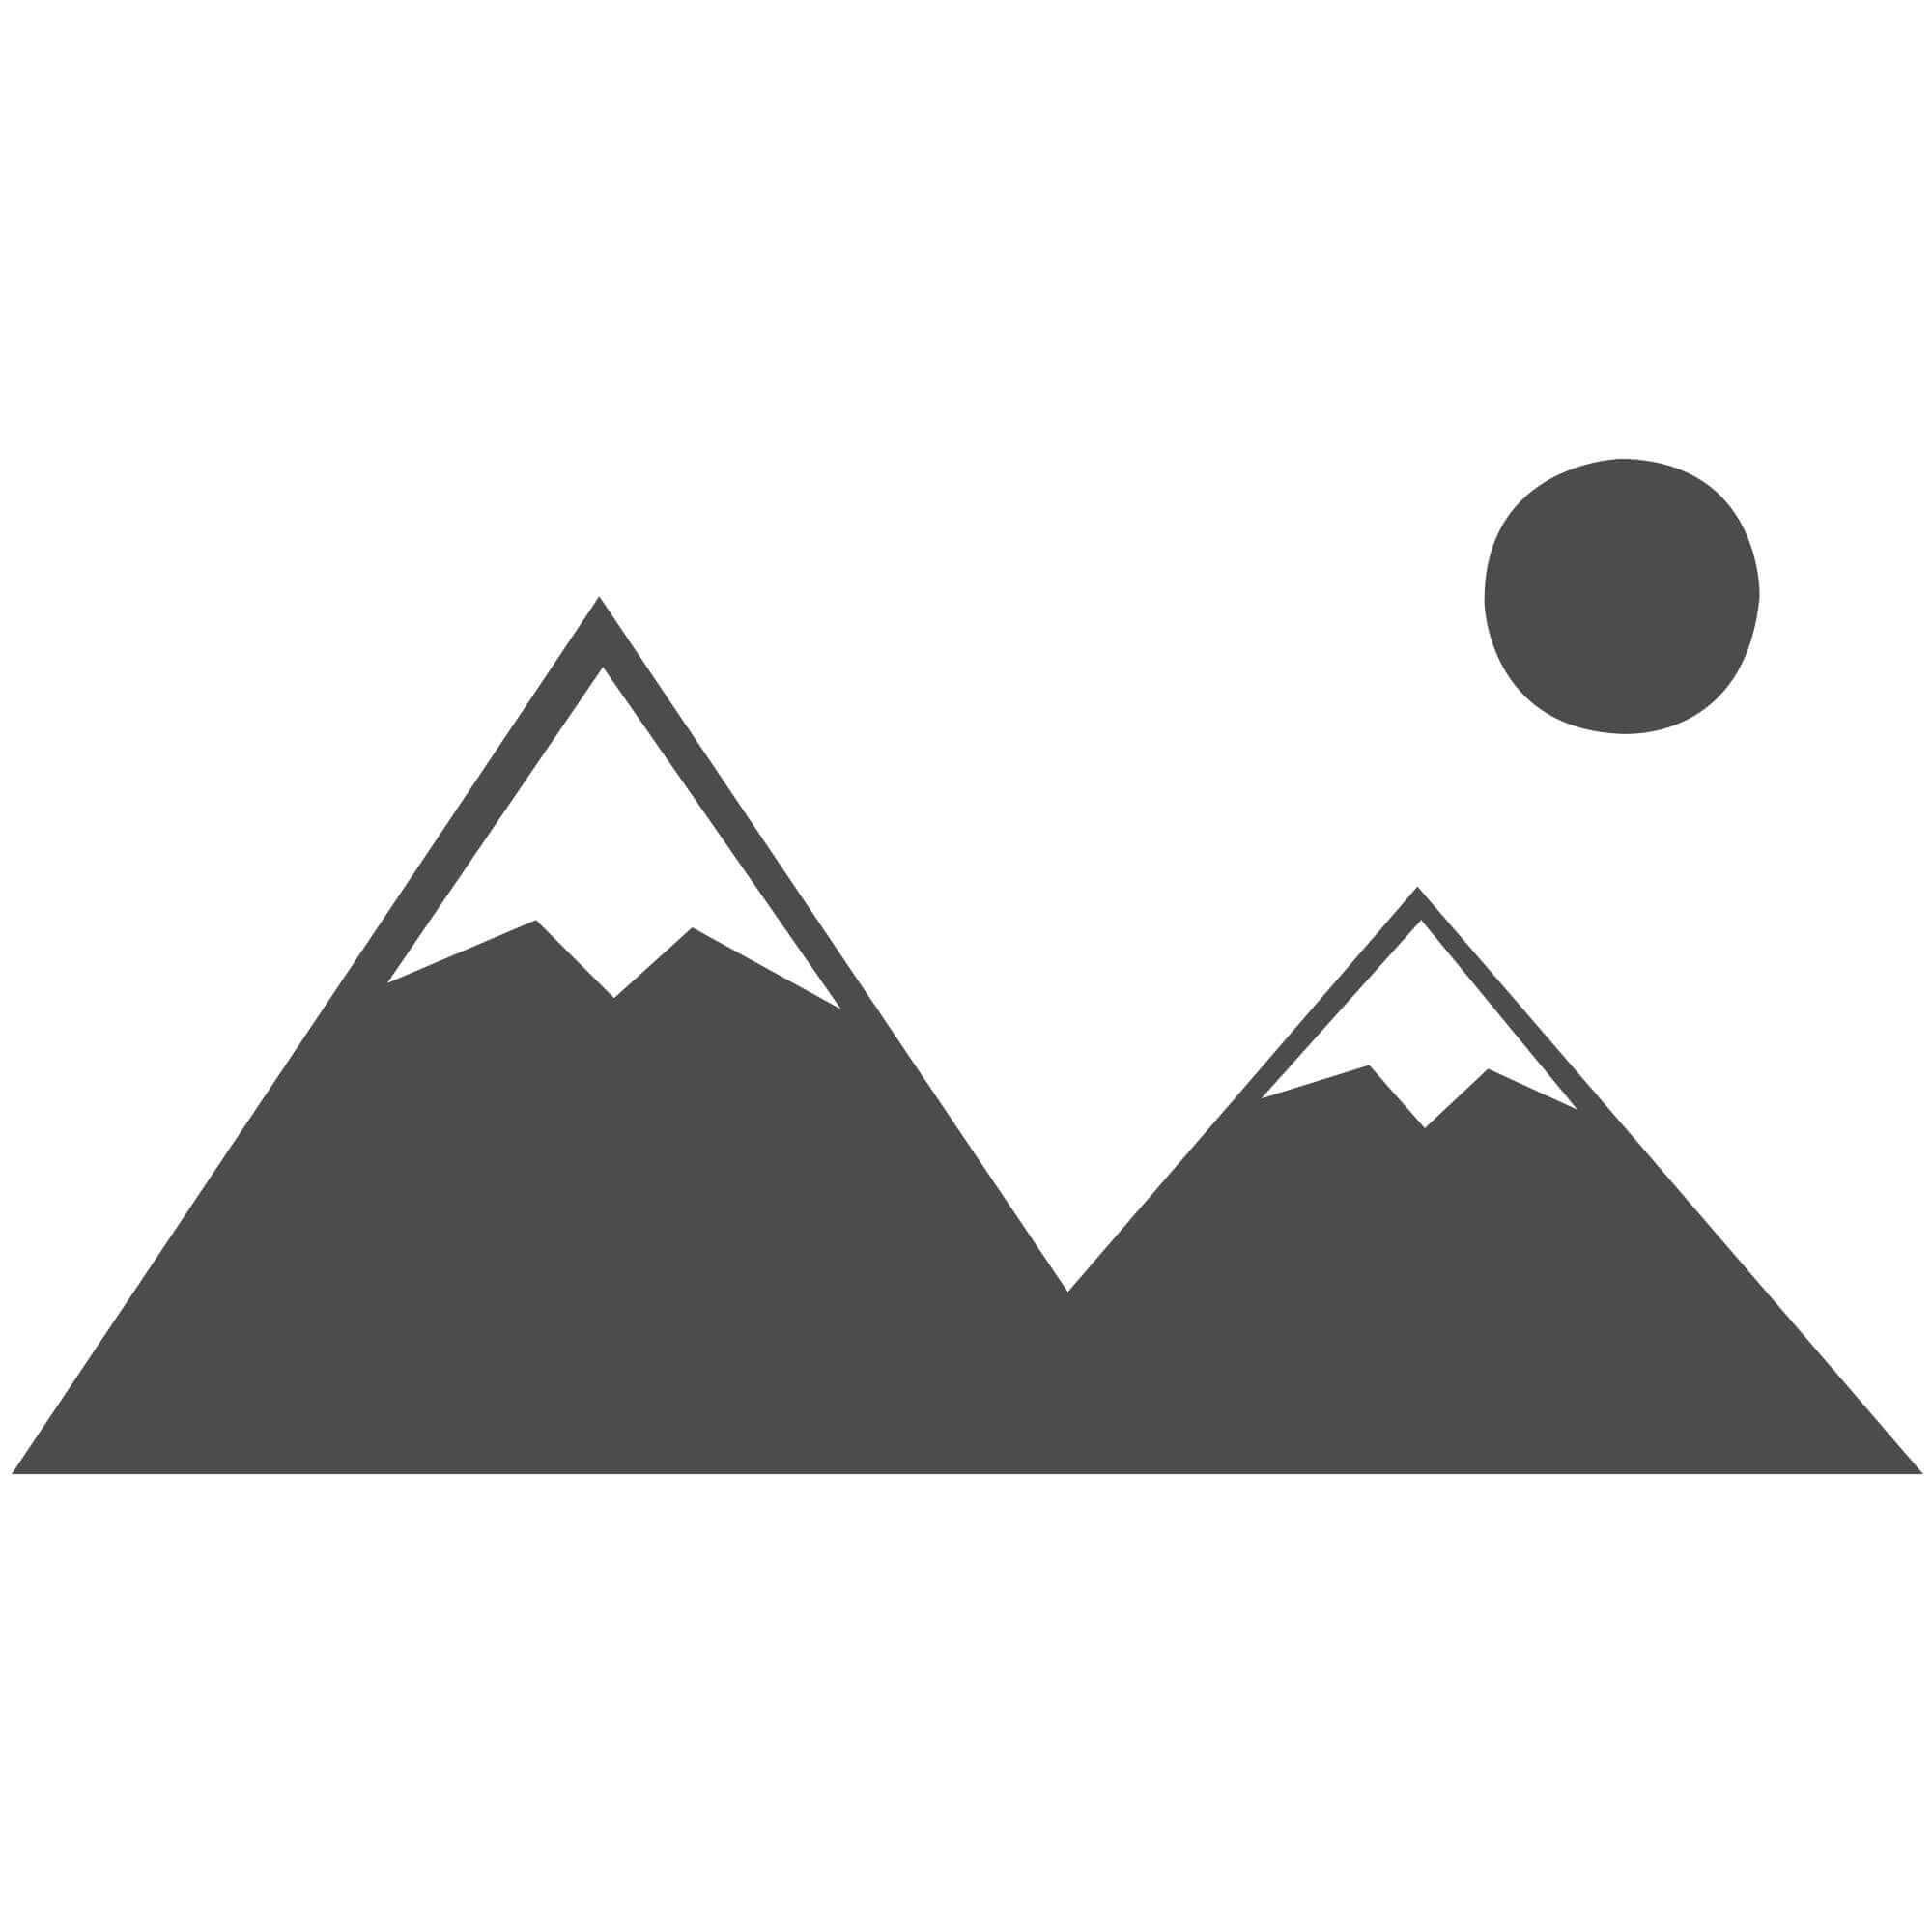 "Infinite Scope Teal Rug - Size 80 x 150 cm (2'8"" x 5')"